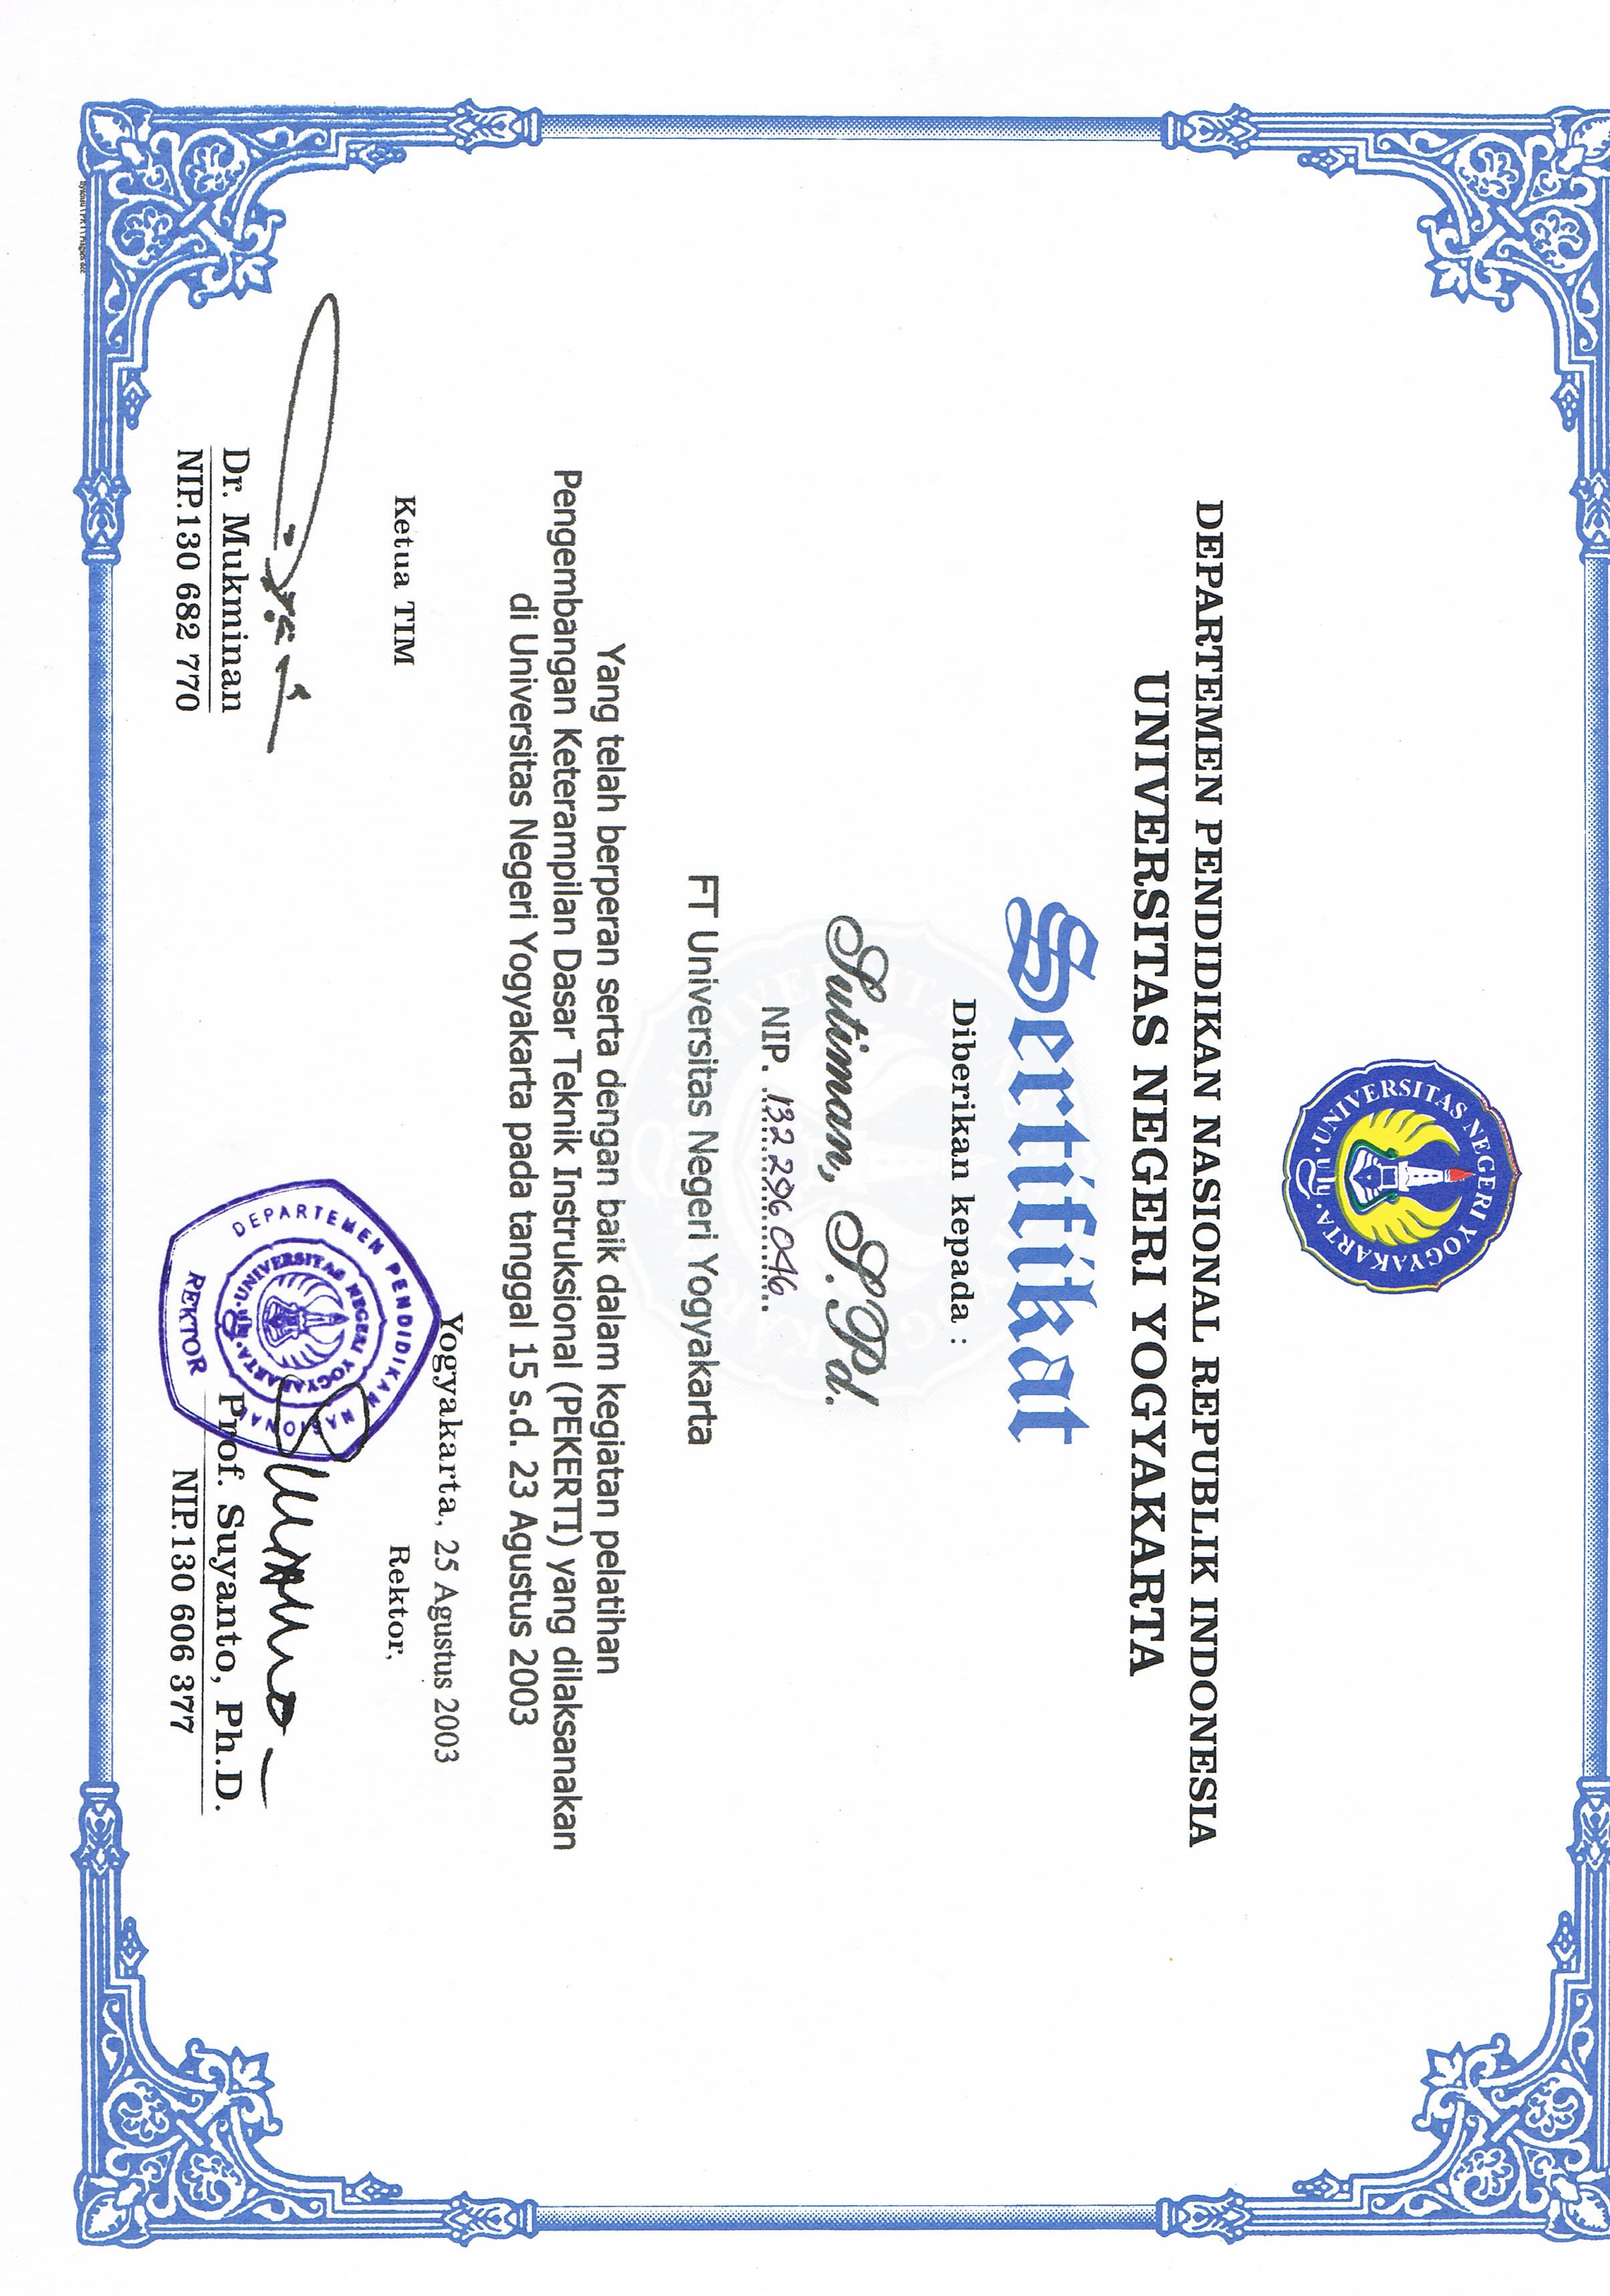 Sertifikat Peserta Pelatihan Pengembangan Keterampilan Dasar Teknik